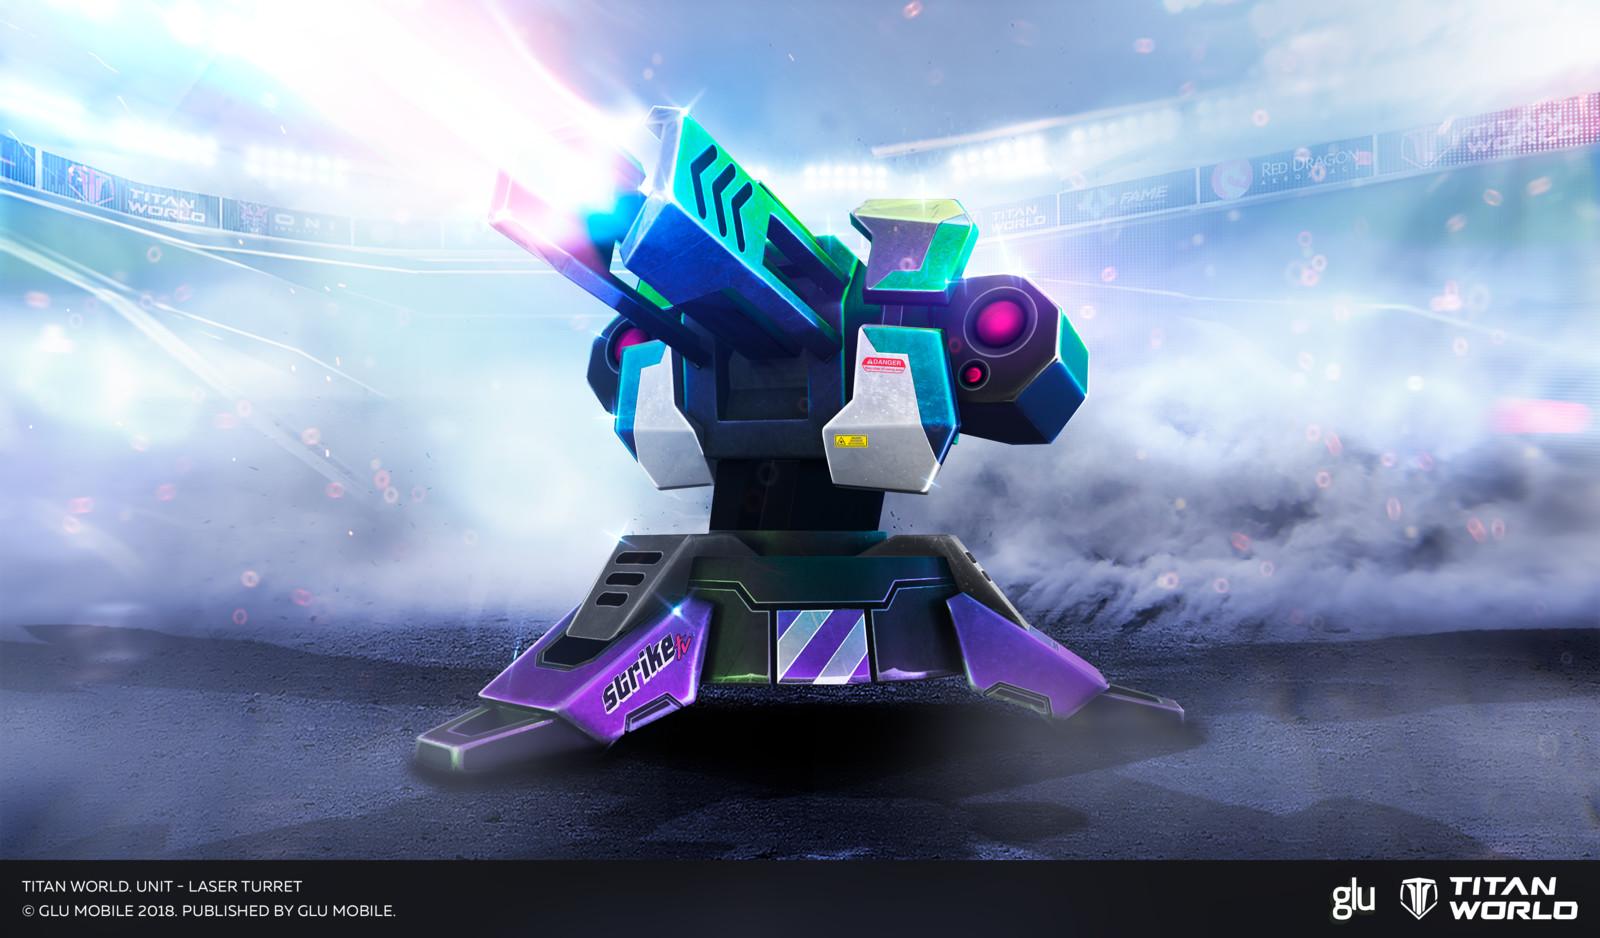 Unit - Laser Turret